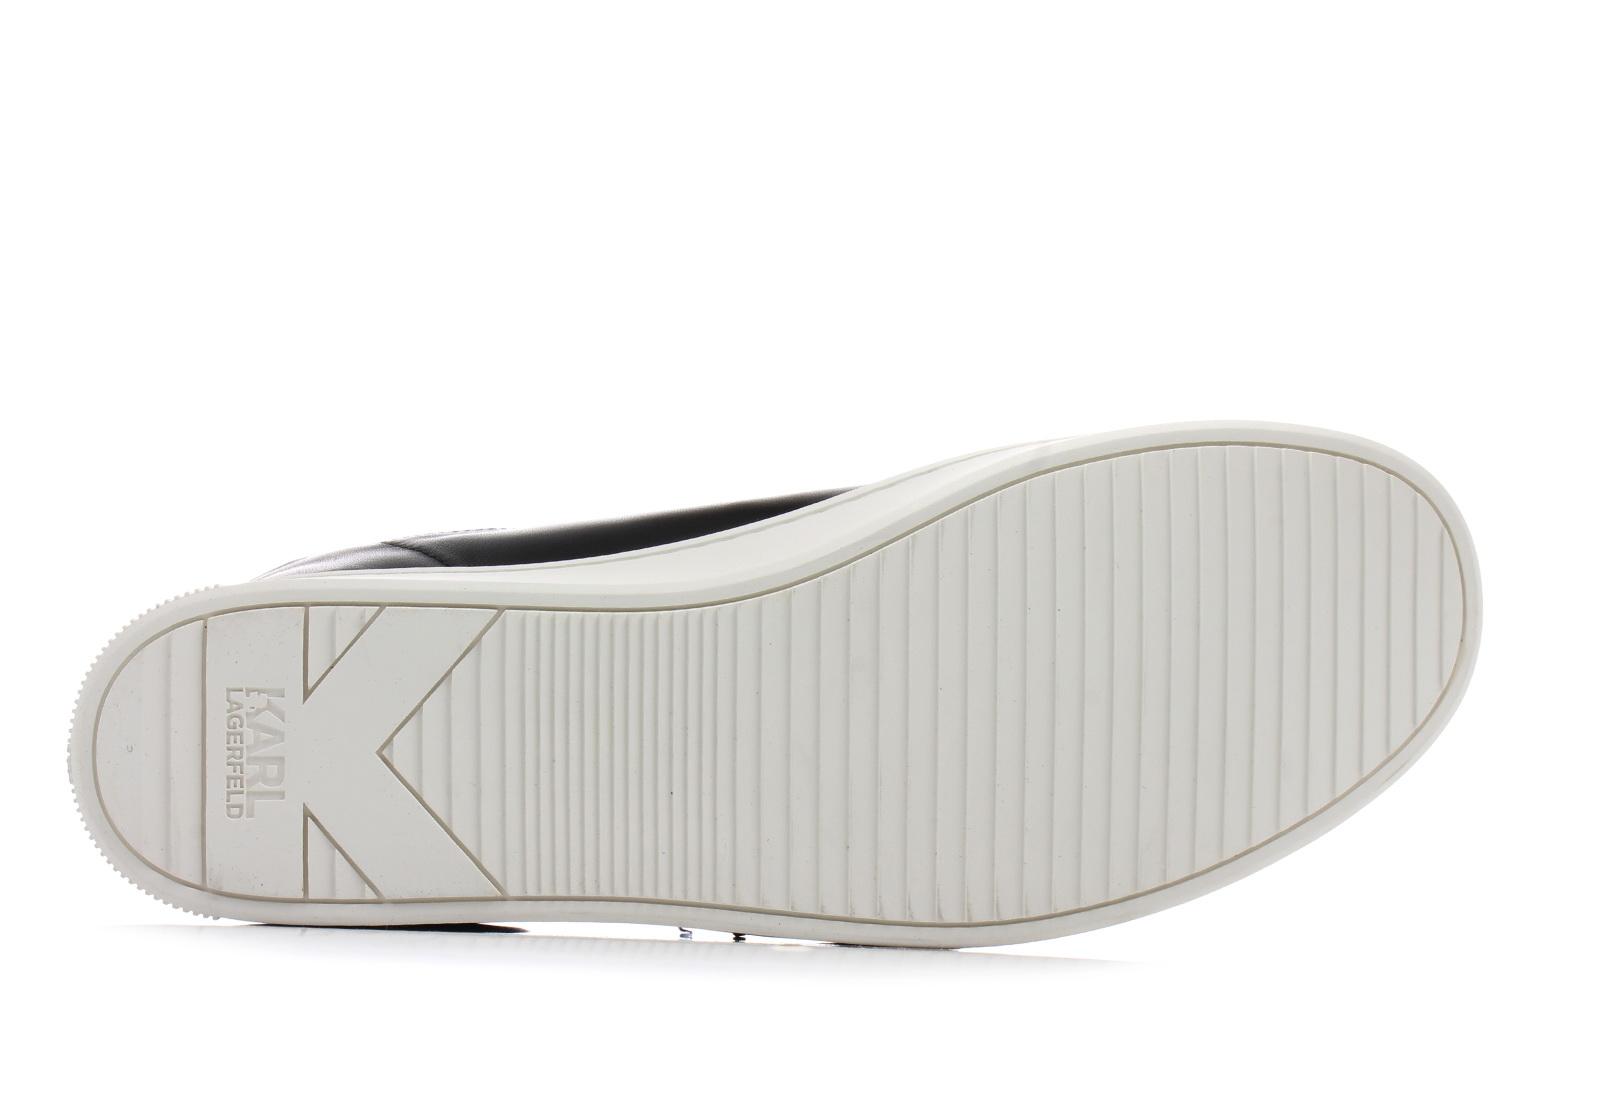 00c3b8c2d2 Karl Lagerfeld Cipő - Kourt Karl Ikonik - KL51210-000 - Office Shoes ...